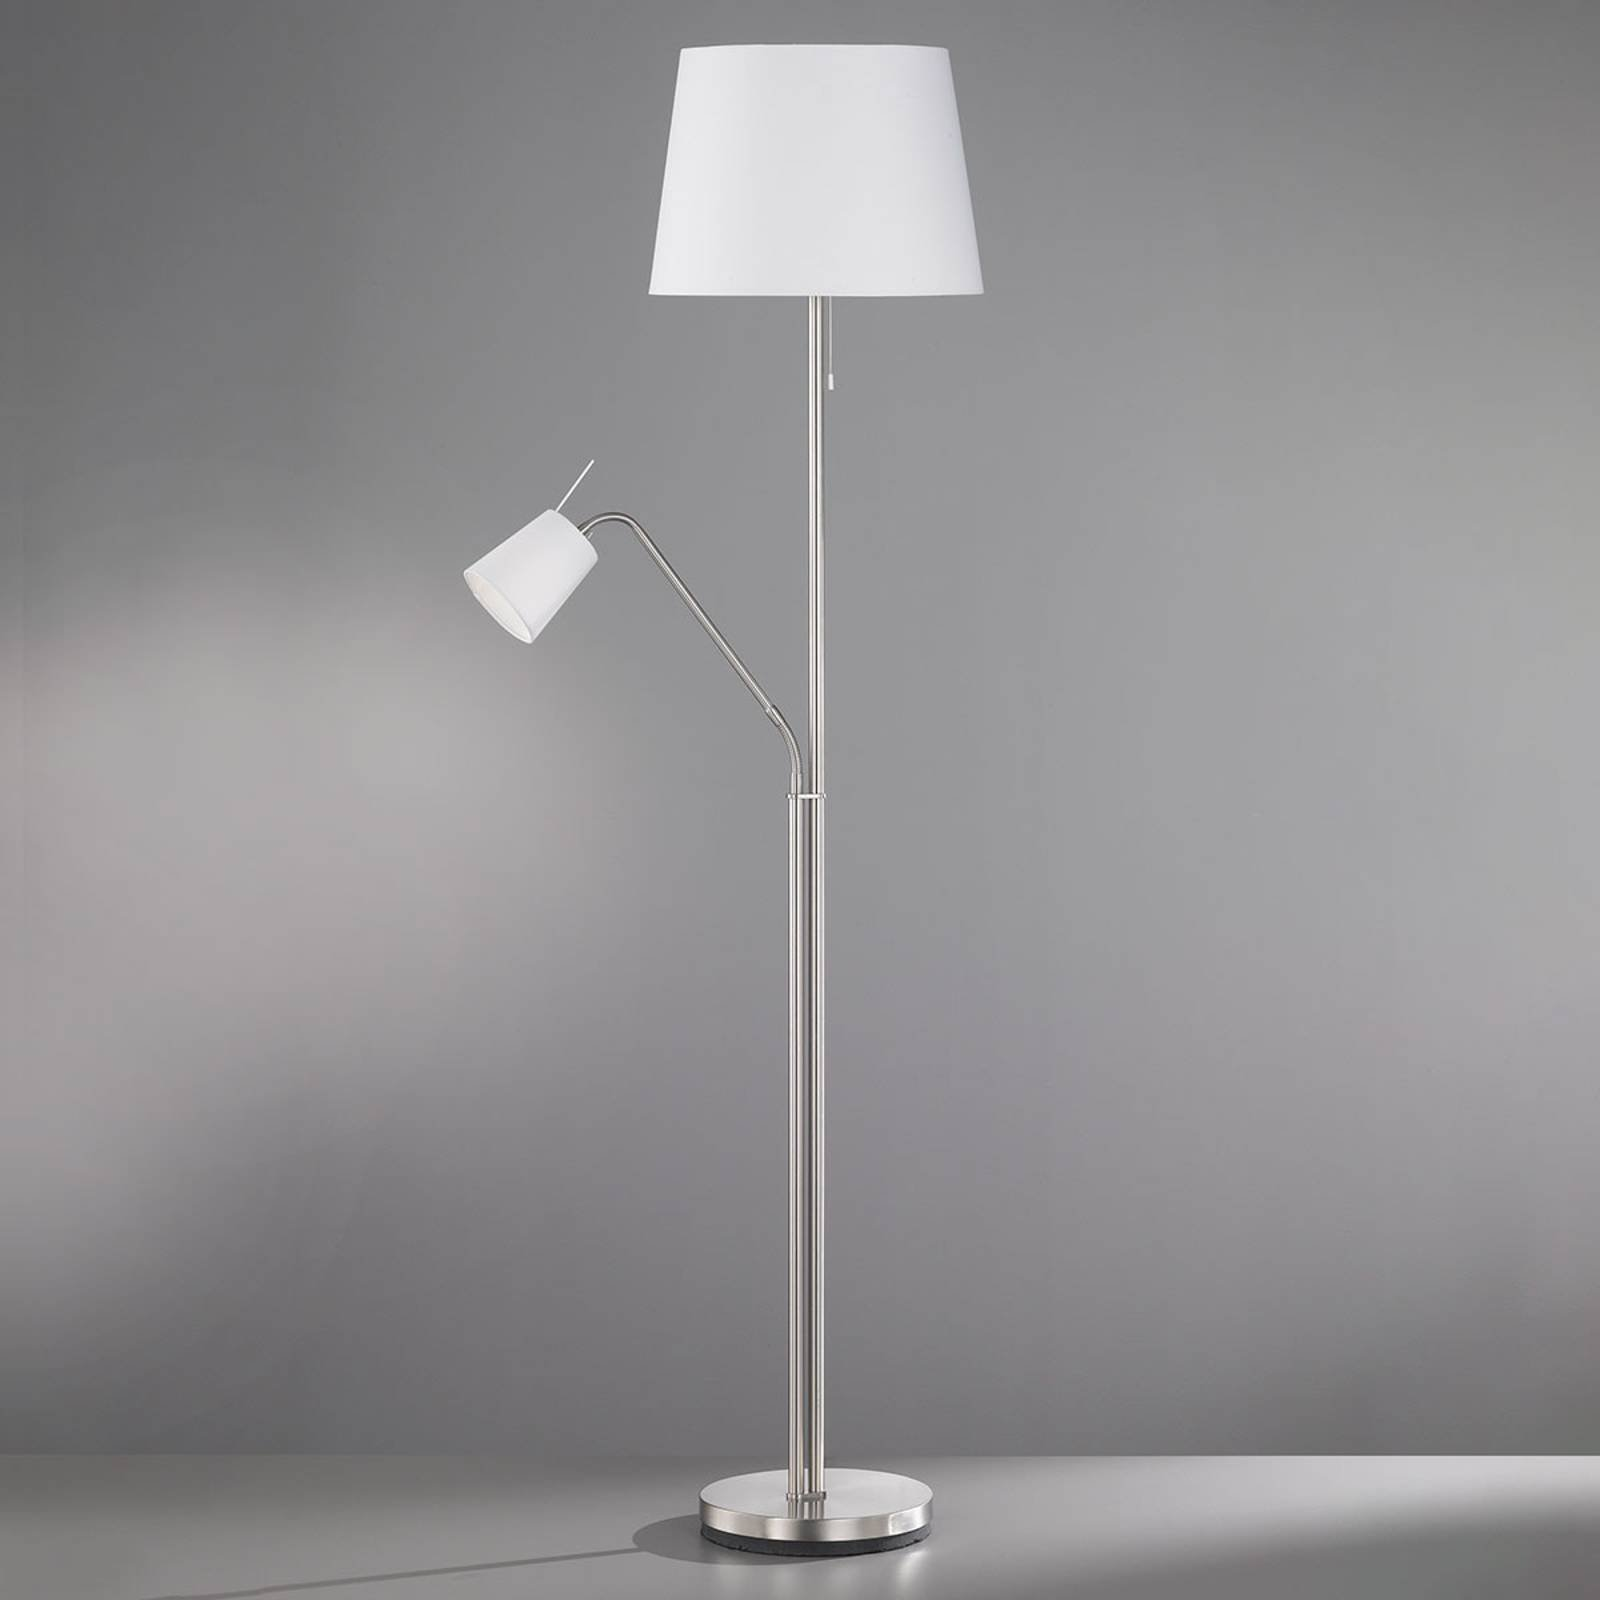 Tekstil-gulvlampe Layer med leselampe hvit